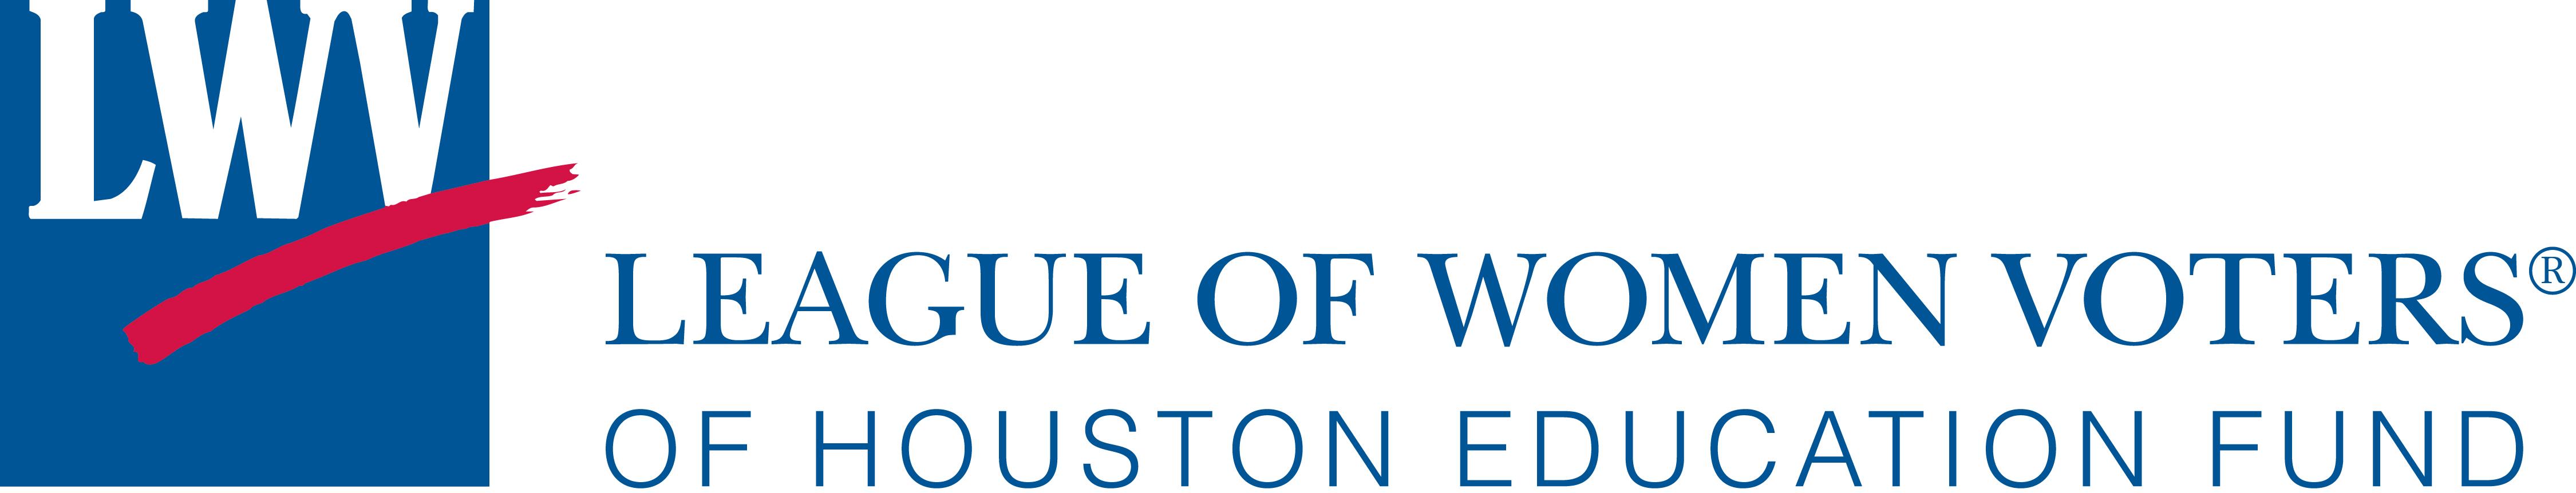 LWV-Houston Education Fund